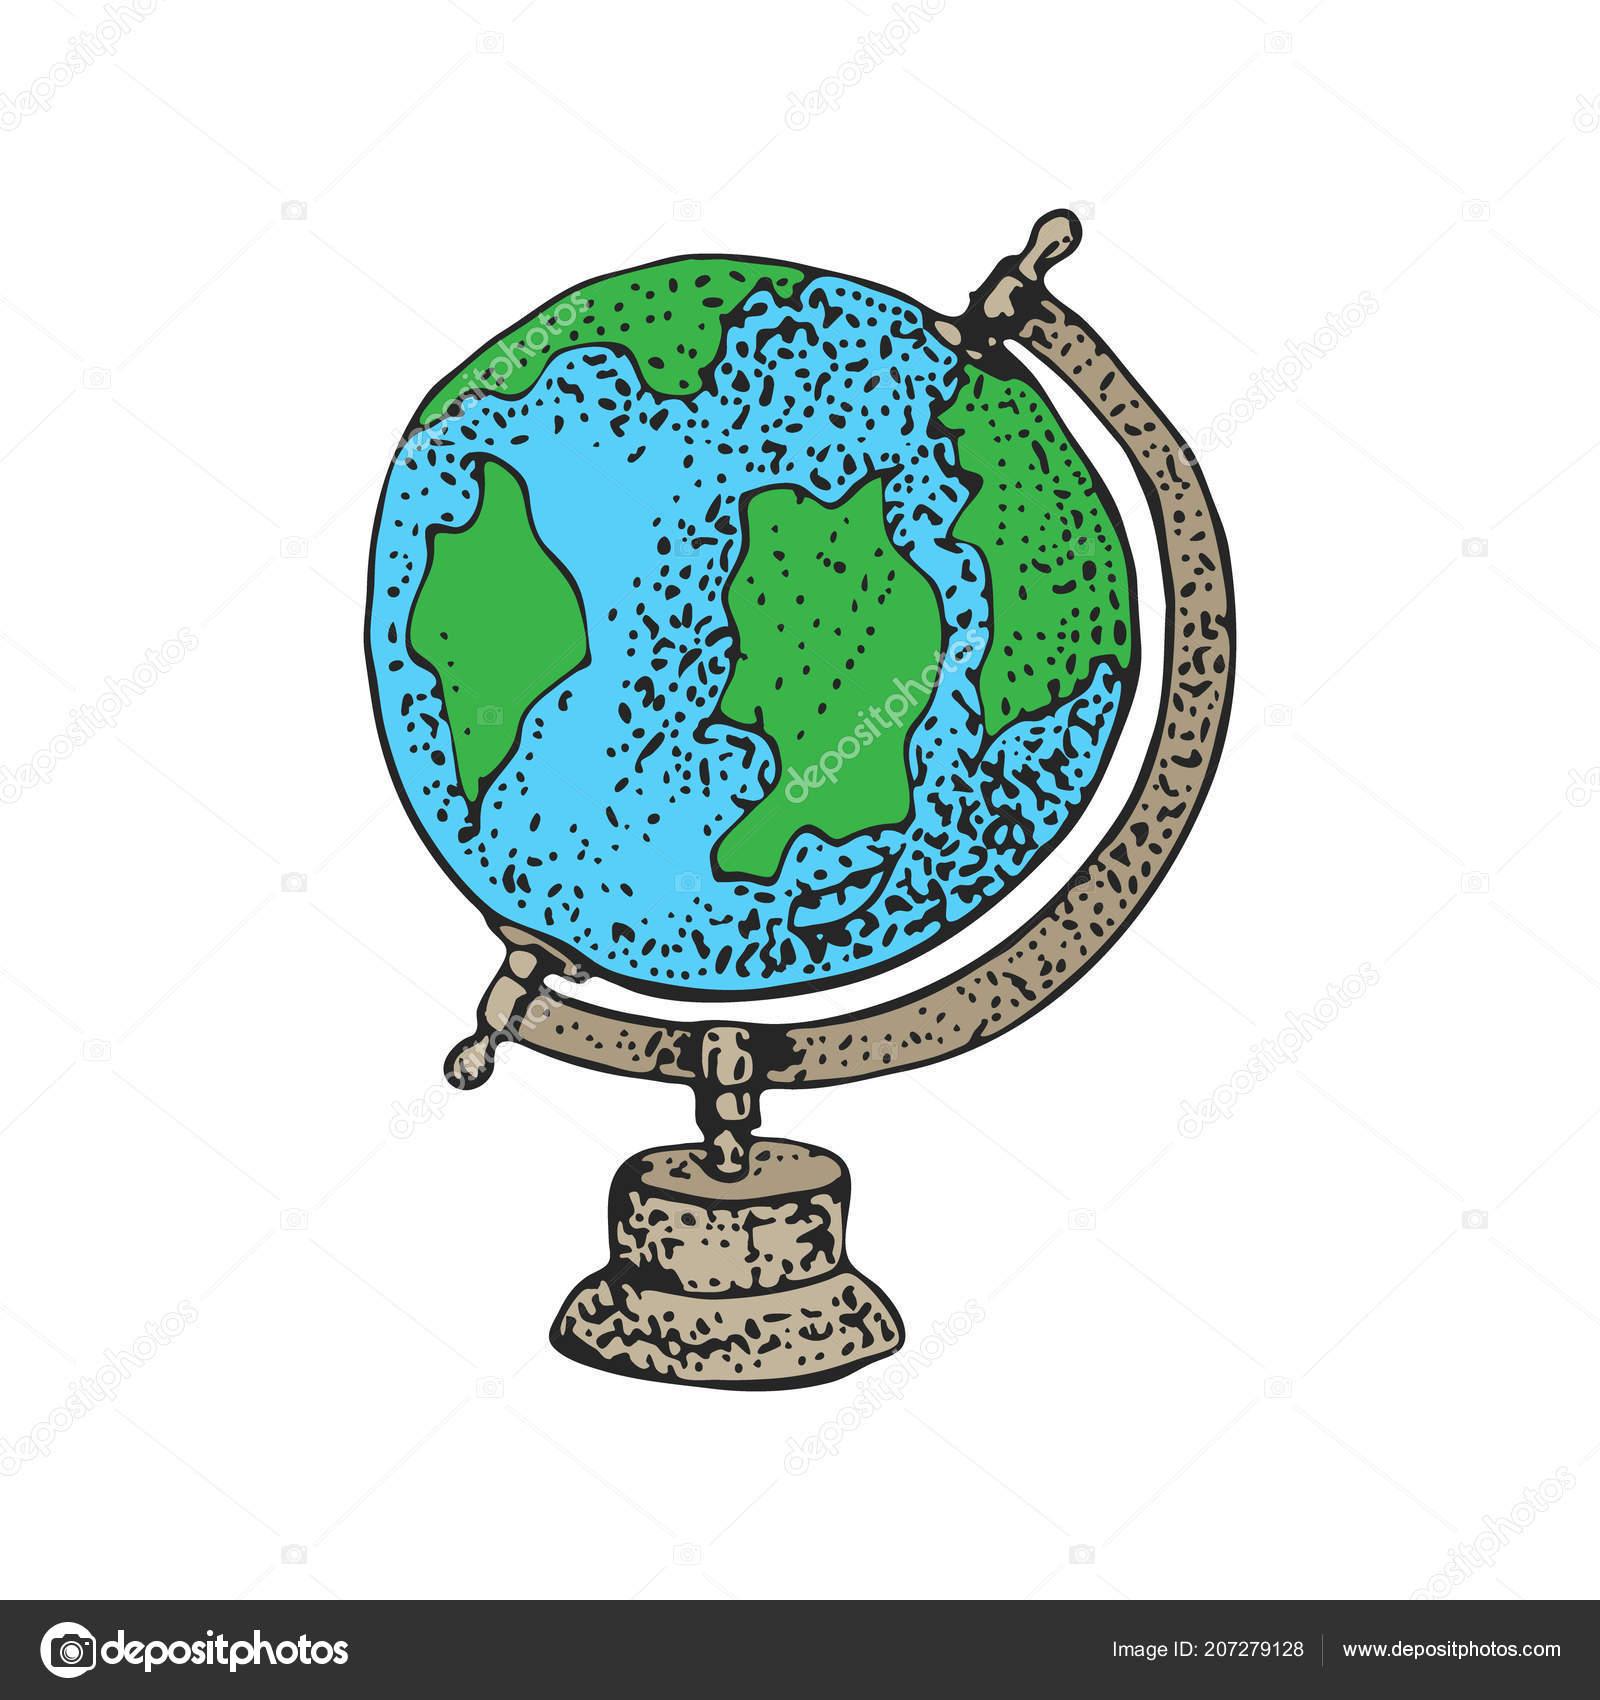 School geography globe cartoon vector illustration earth world map school geography globe cartoon vector illustration earth world map education stock vector gumiabroncs Gallery